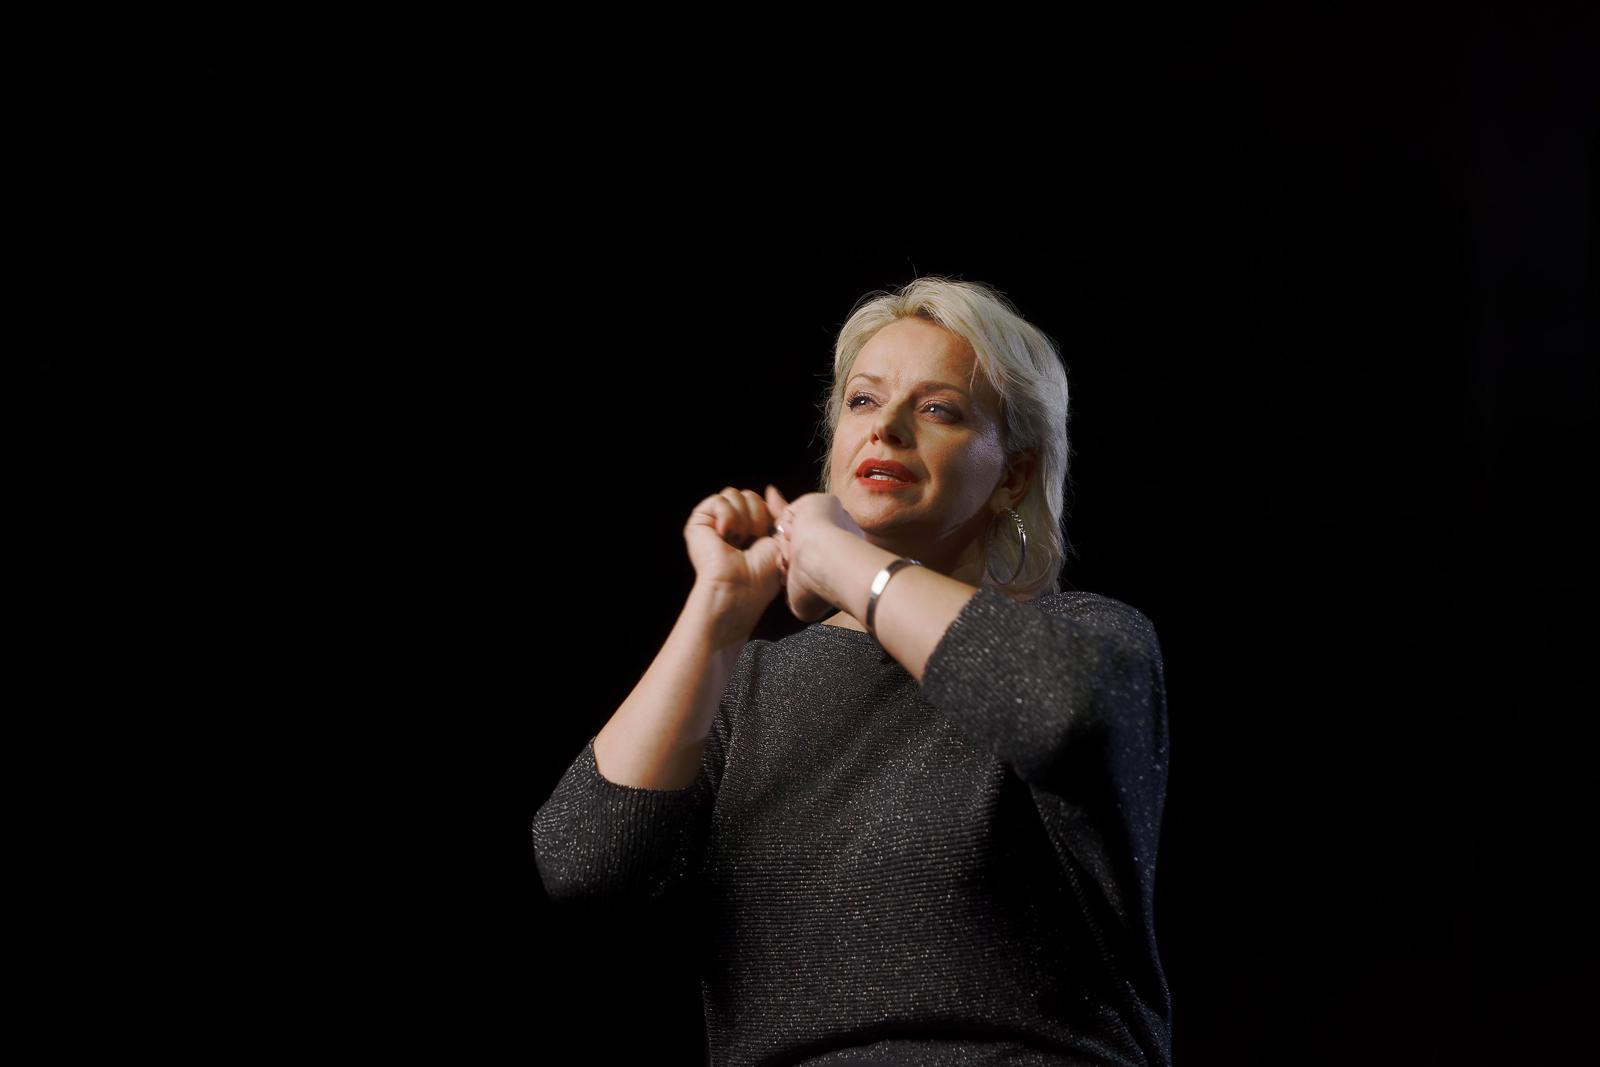 ukrainian actor irma vitovska